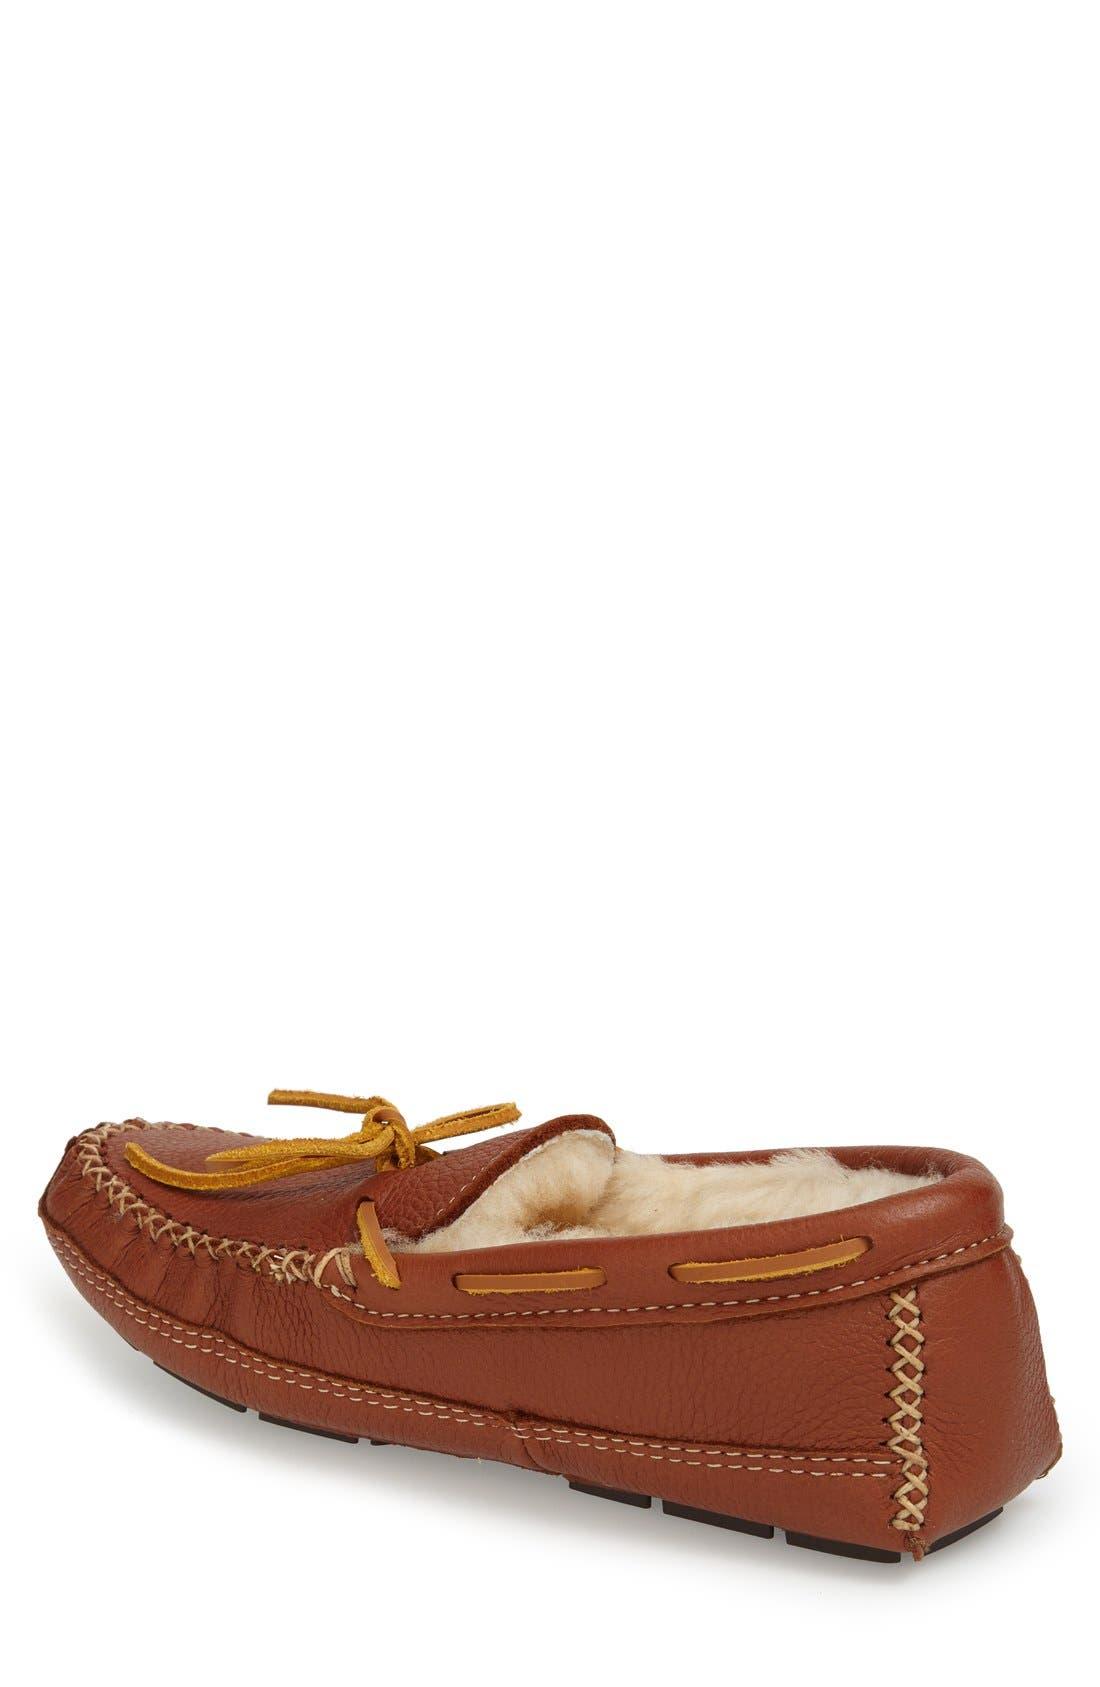 Genuine Shearling Lined Leather Slipper,                             Alternate thumbnail 2, color,                             CARMEL